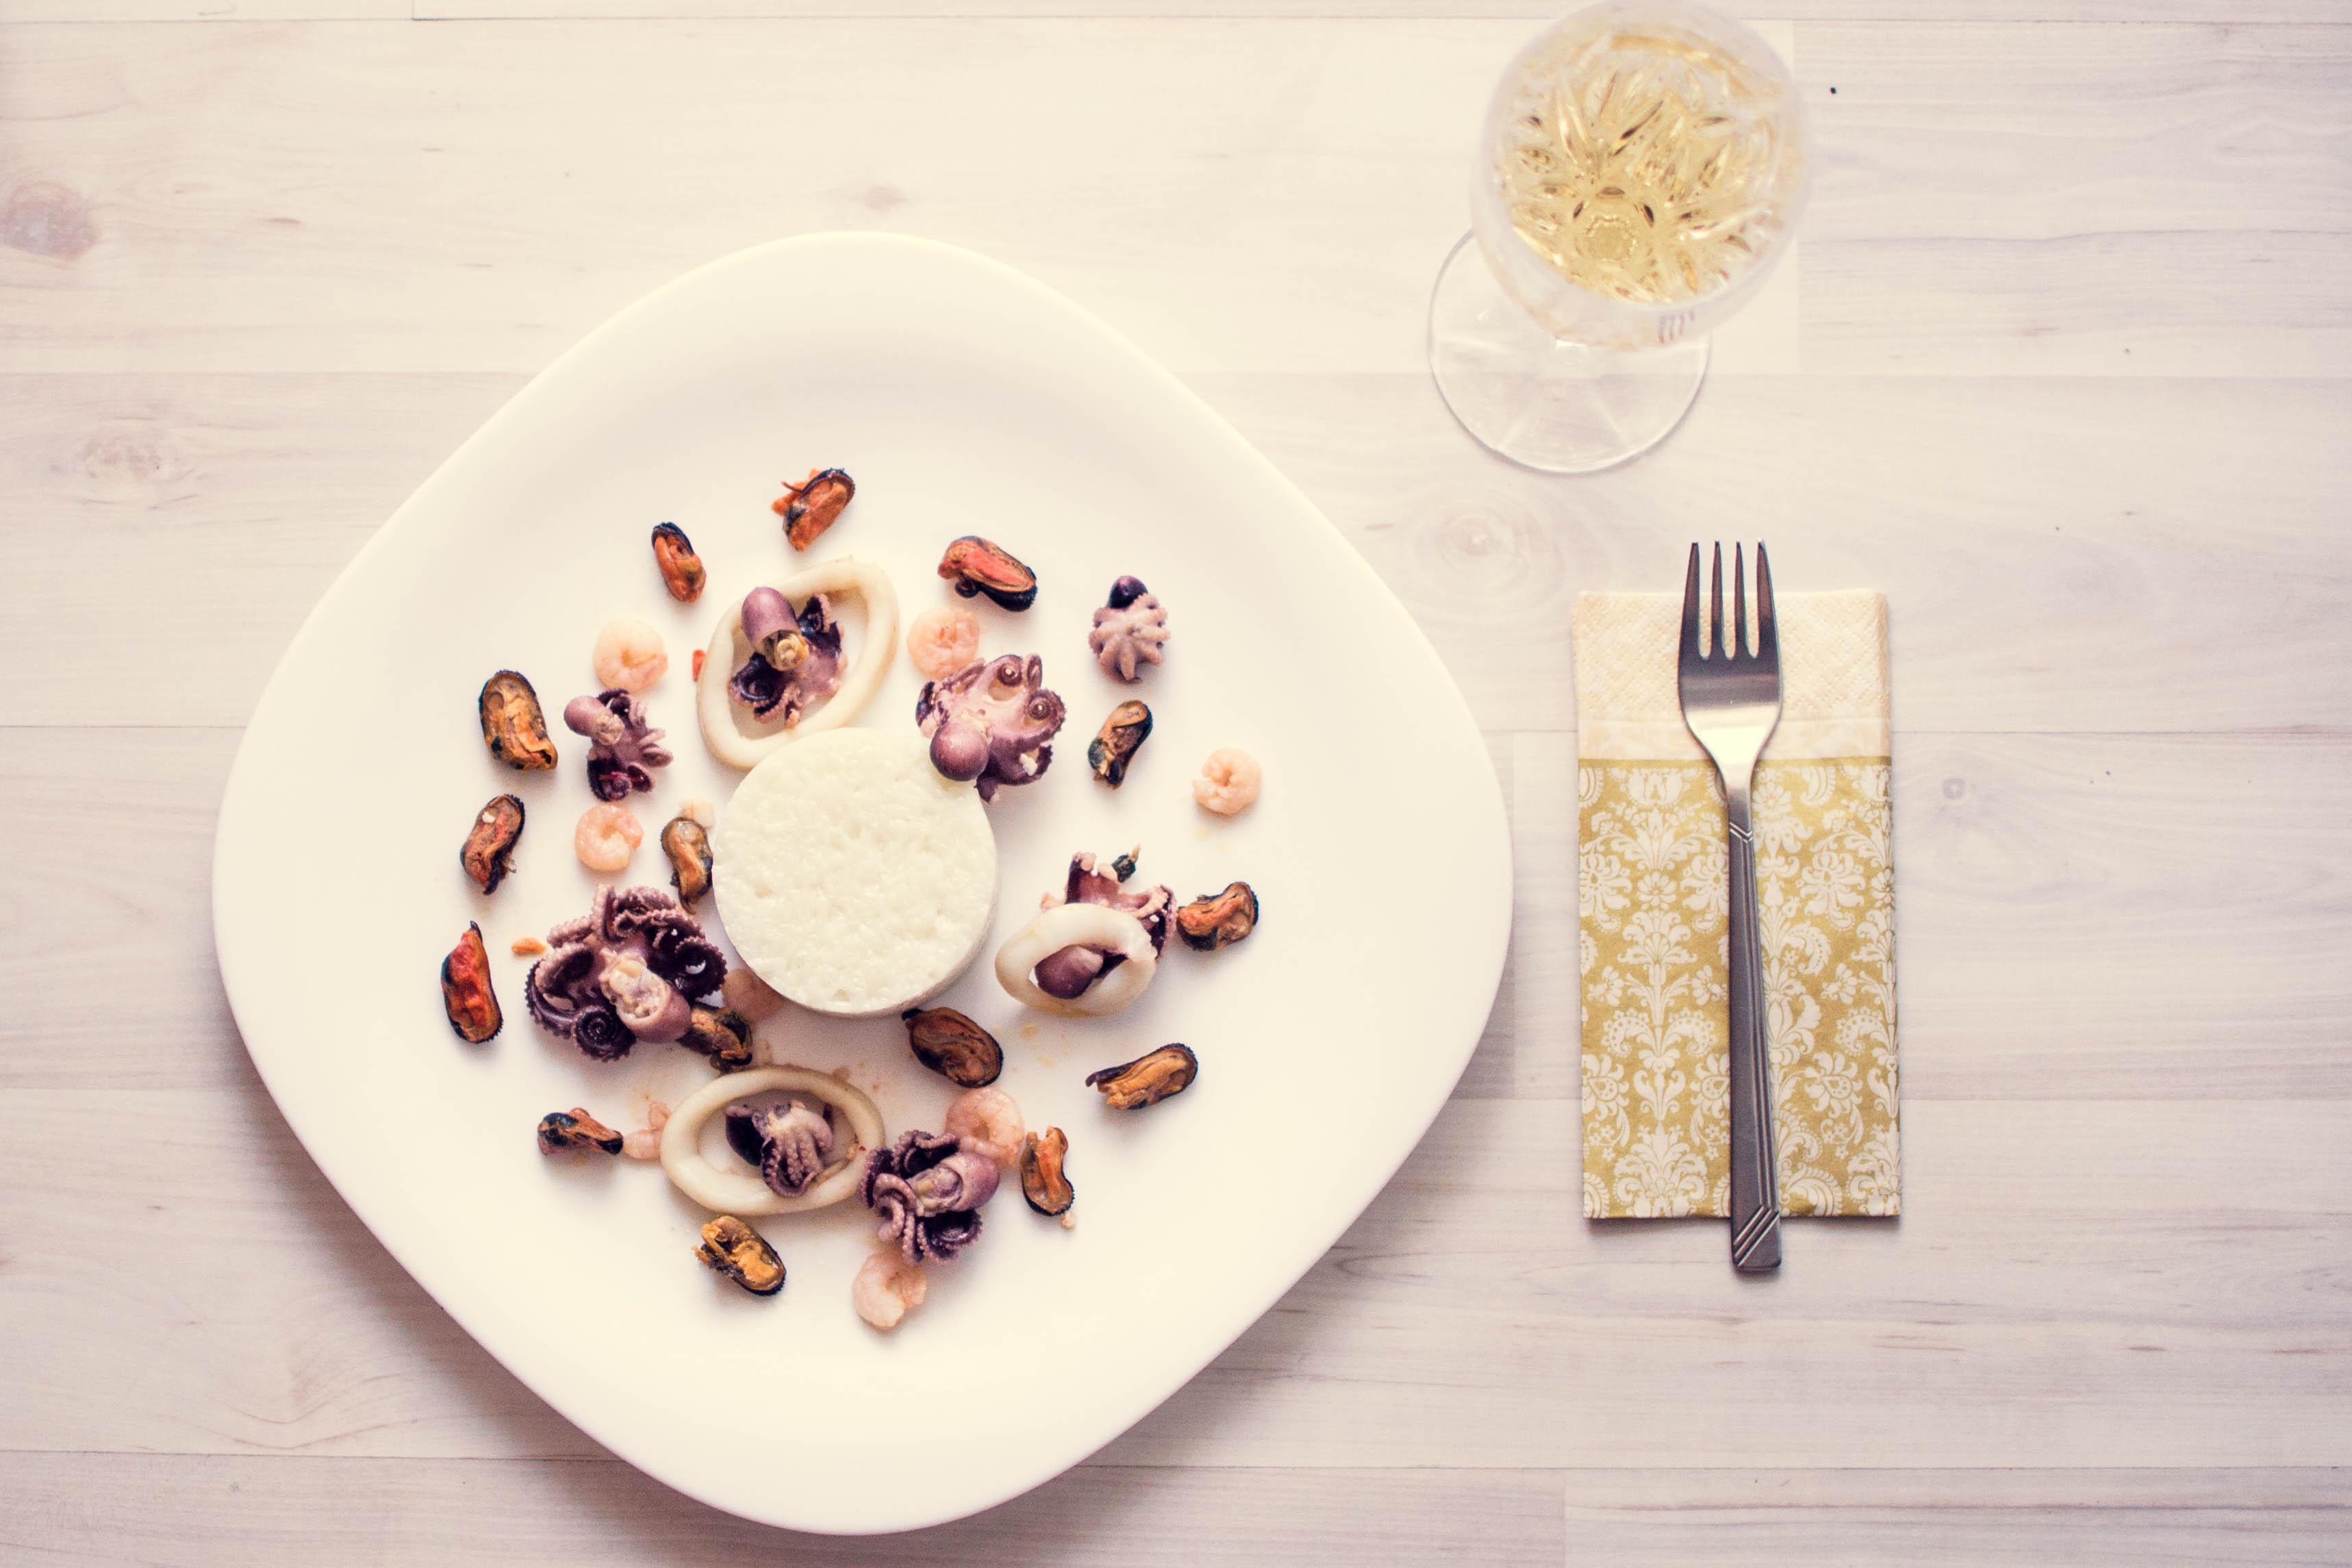 Risotto cu fructe de mare